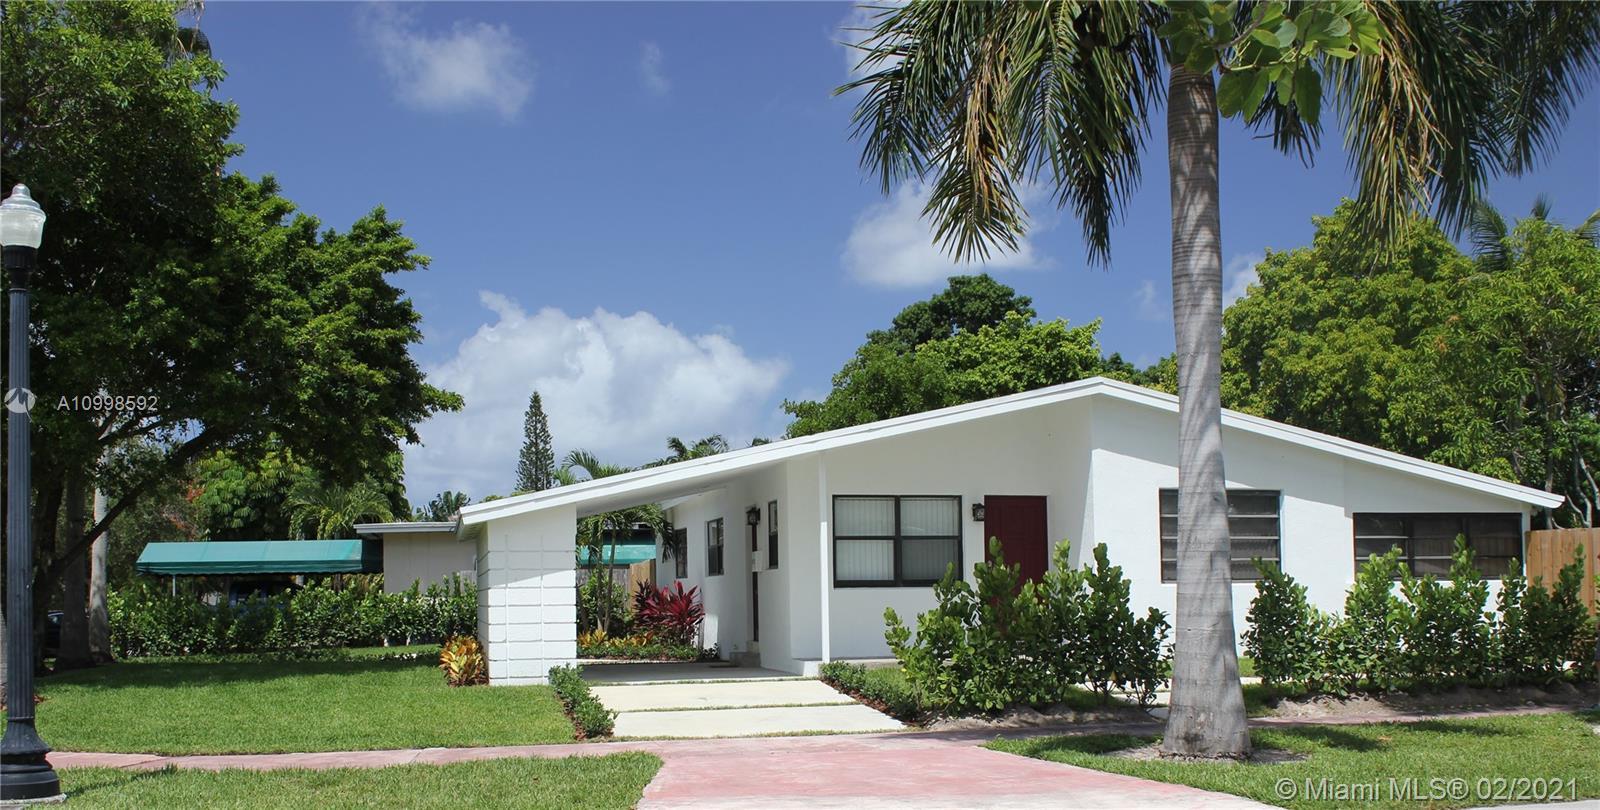 Isle of Normandy - 1420 Biarritz Dr, Miami Beach, FL 33141